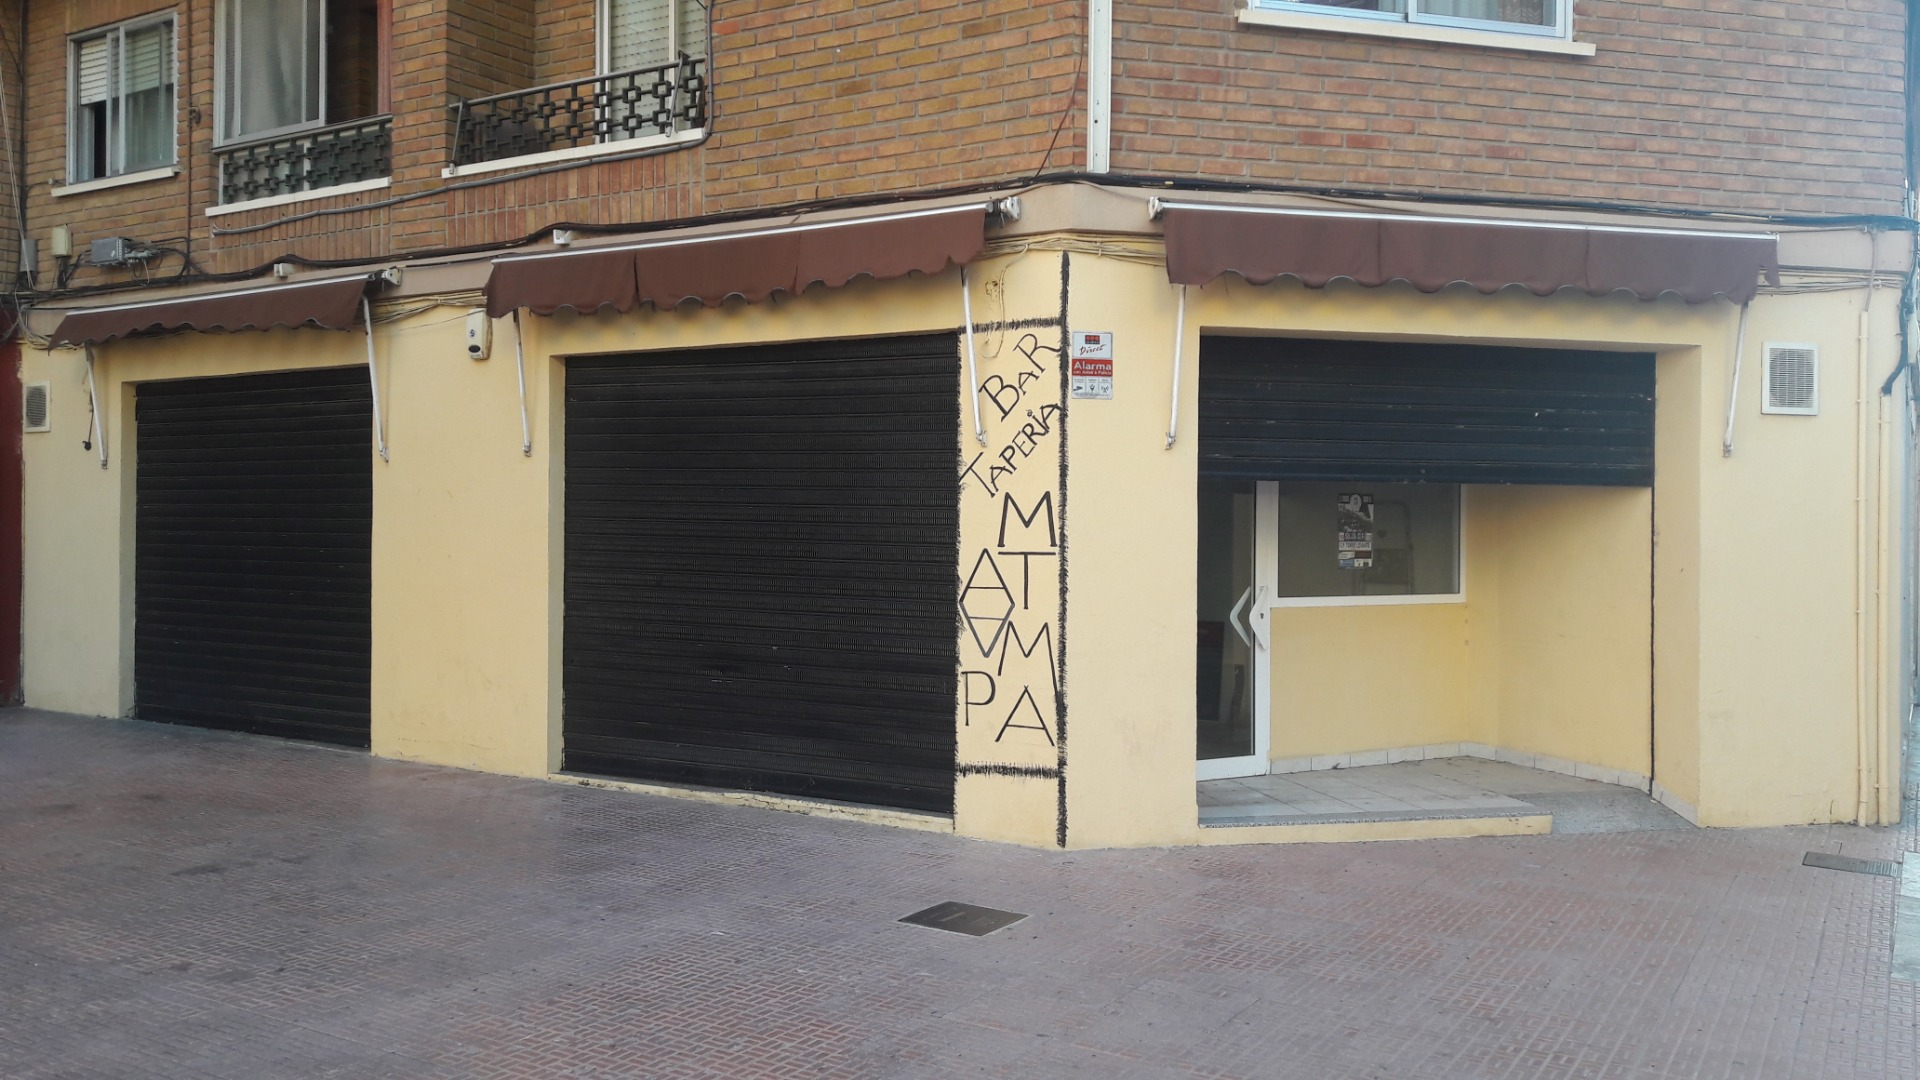 Alquiler Local Comercial  Plaza mercado nuevo. Local chaflán de 130m2